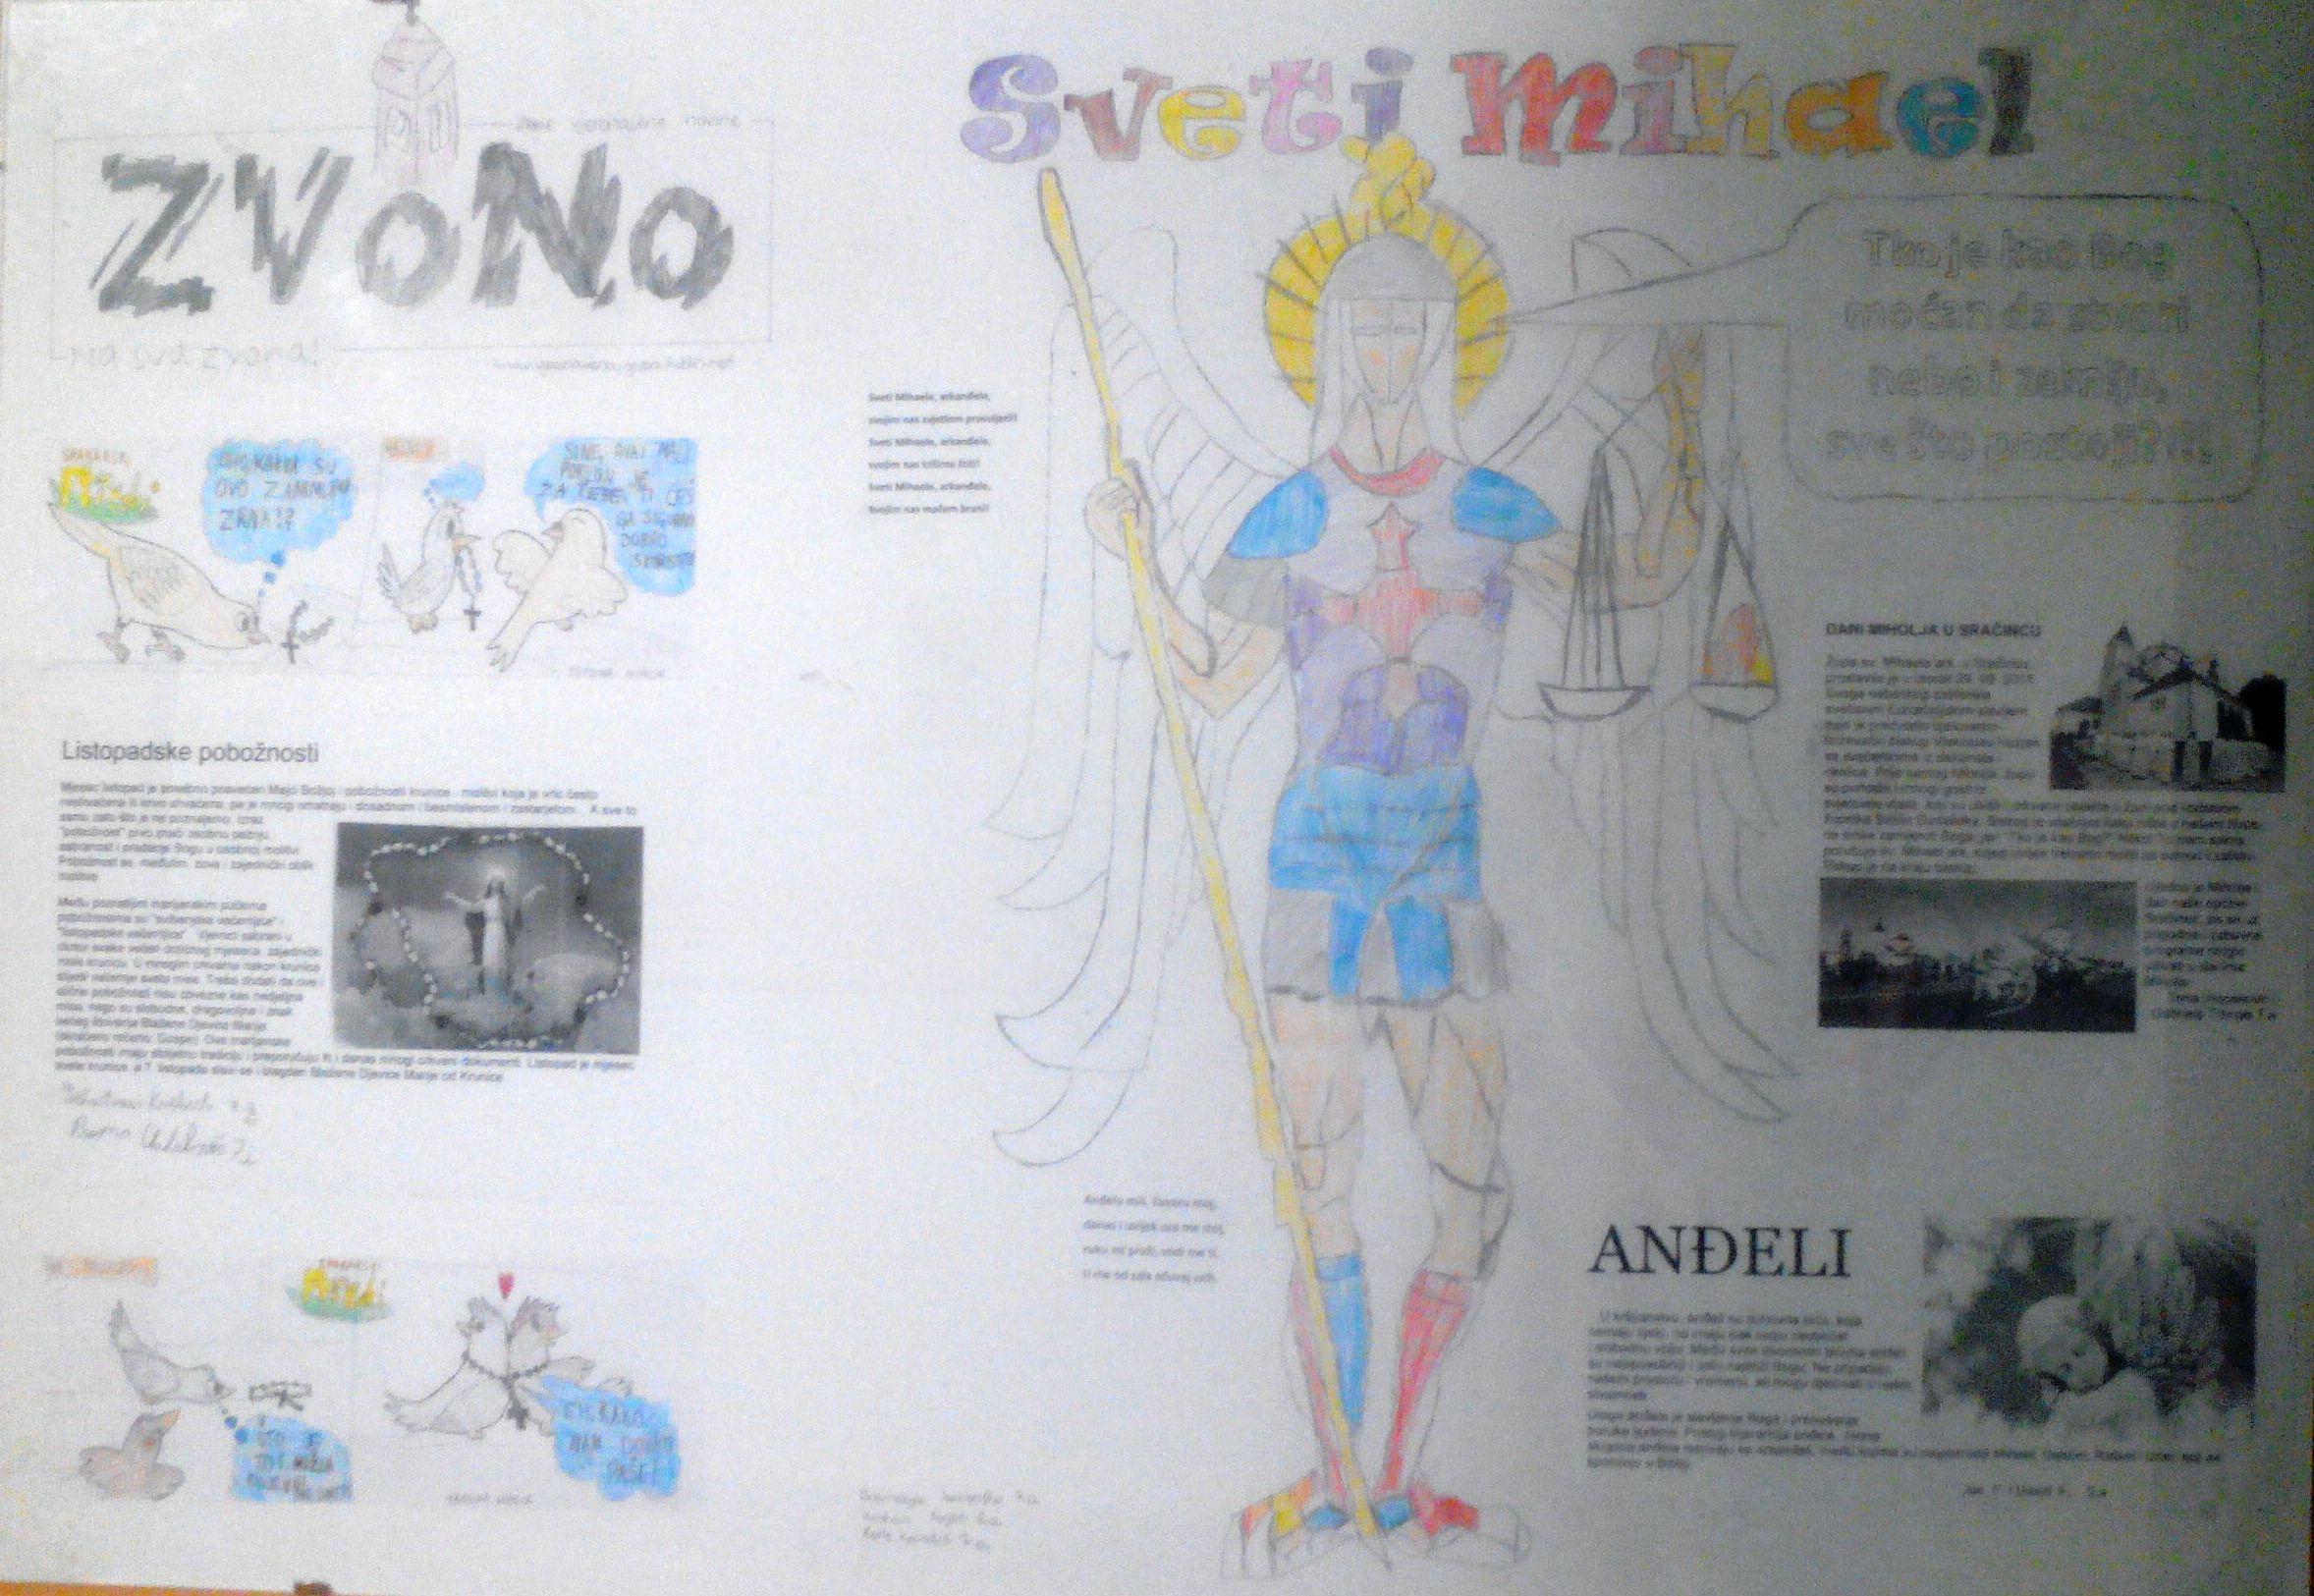 Plakat sv. Mihaela